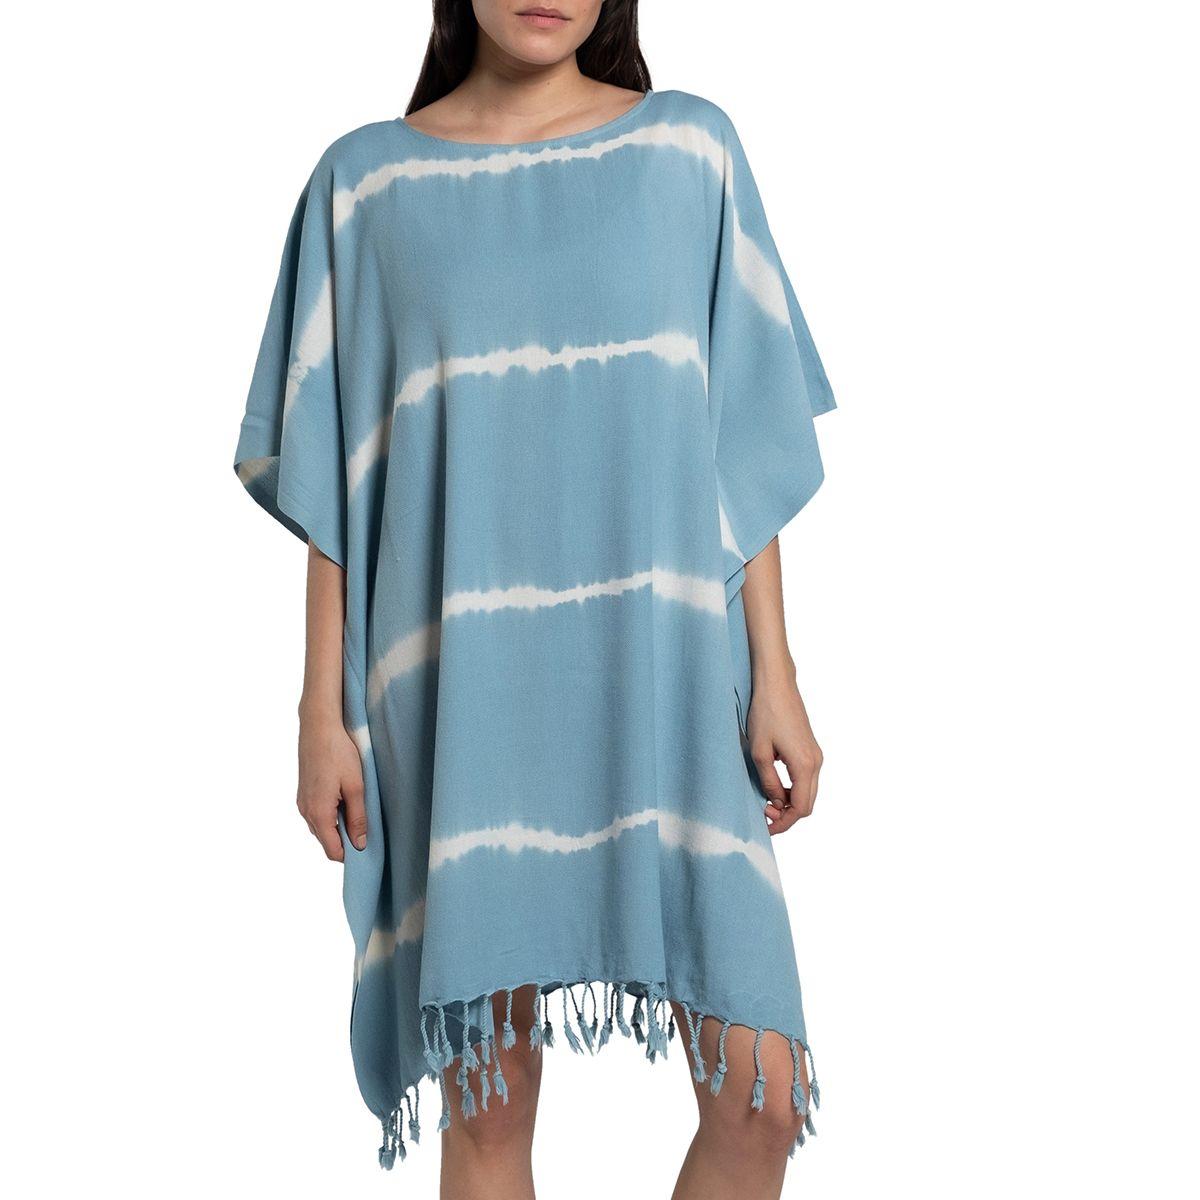 Tunic Daisy / Tie Dye - Base Light Blue